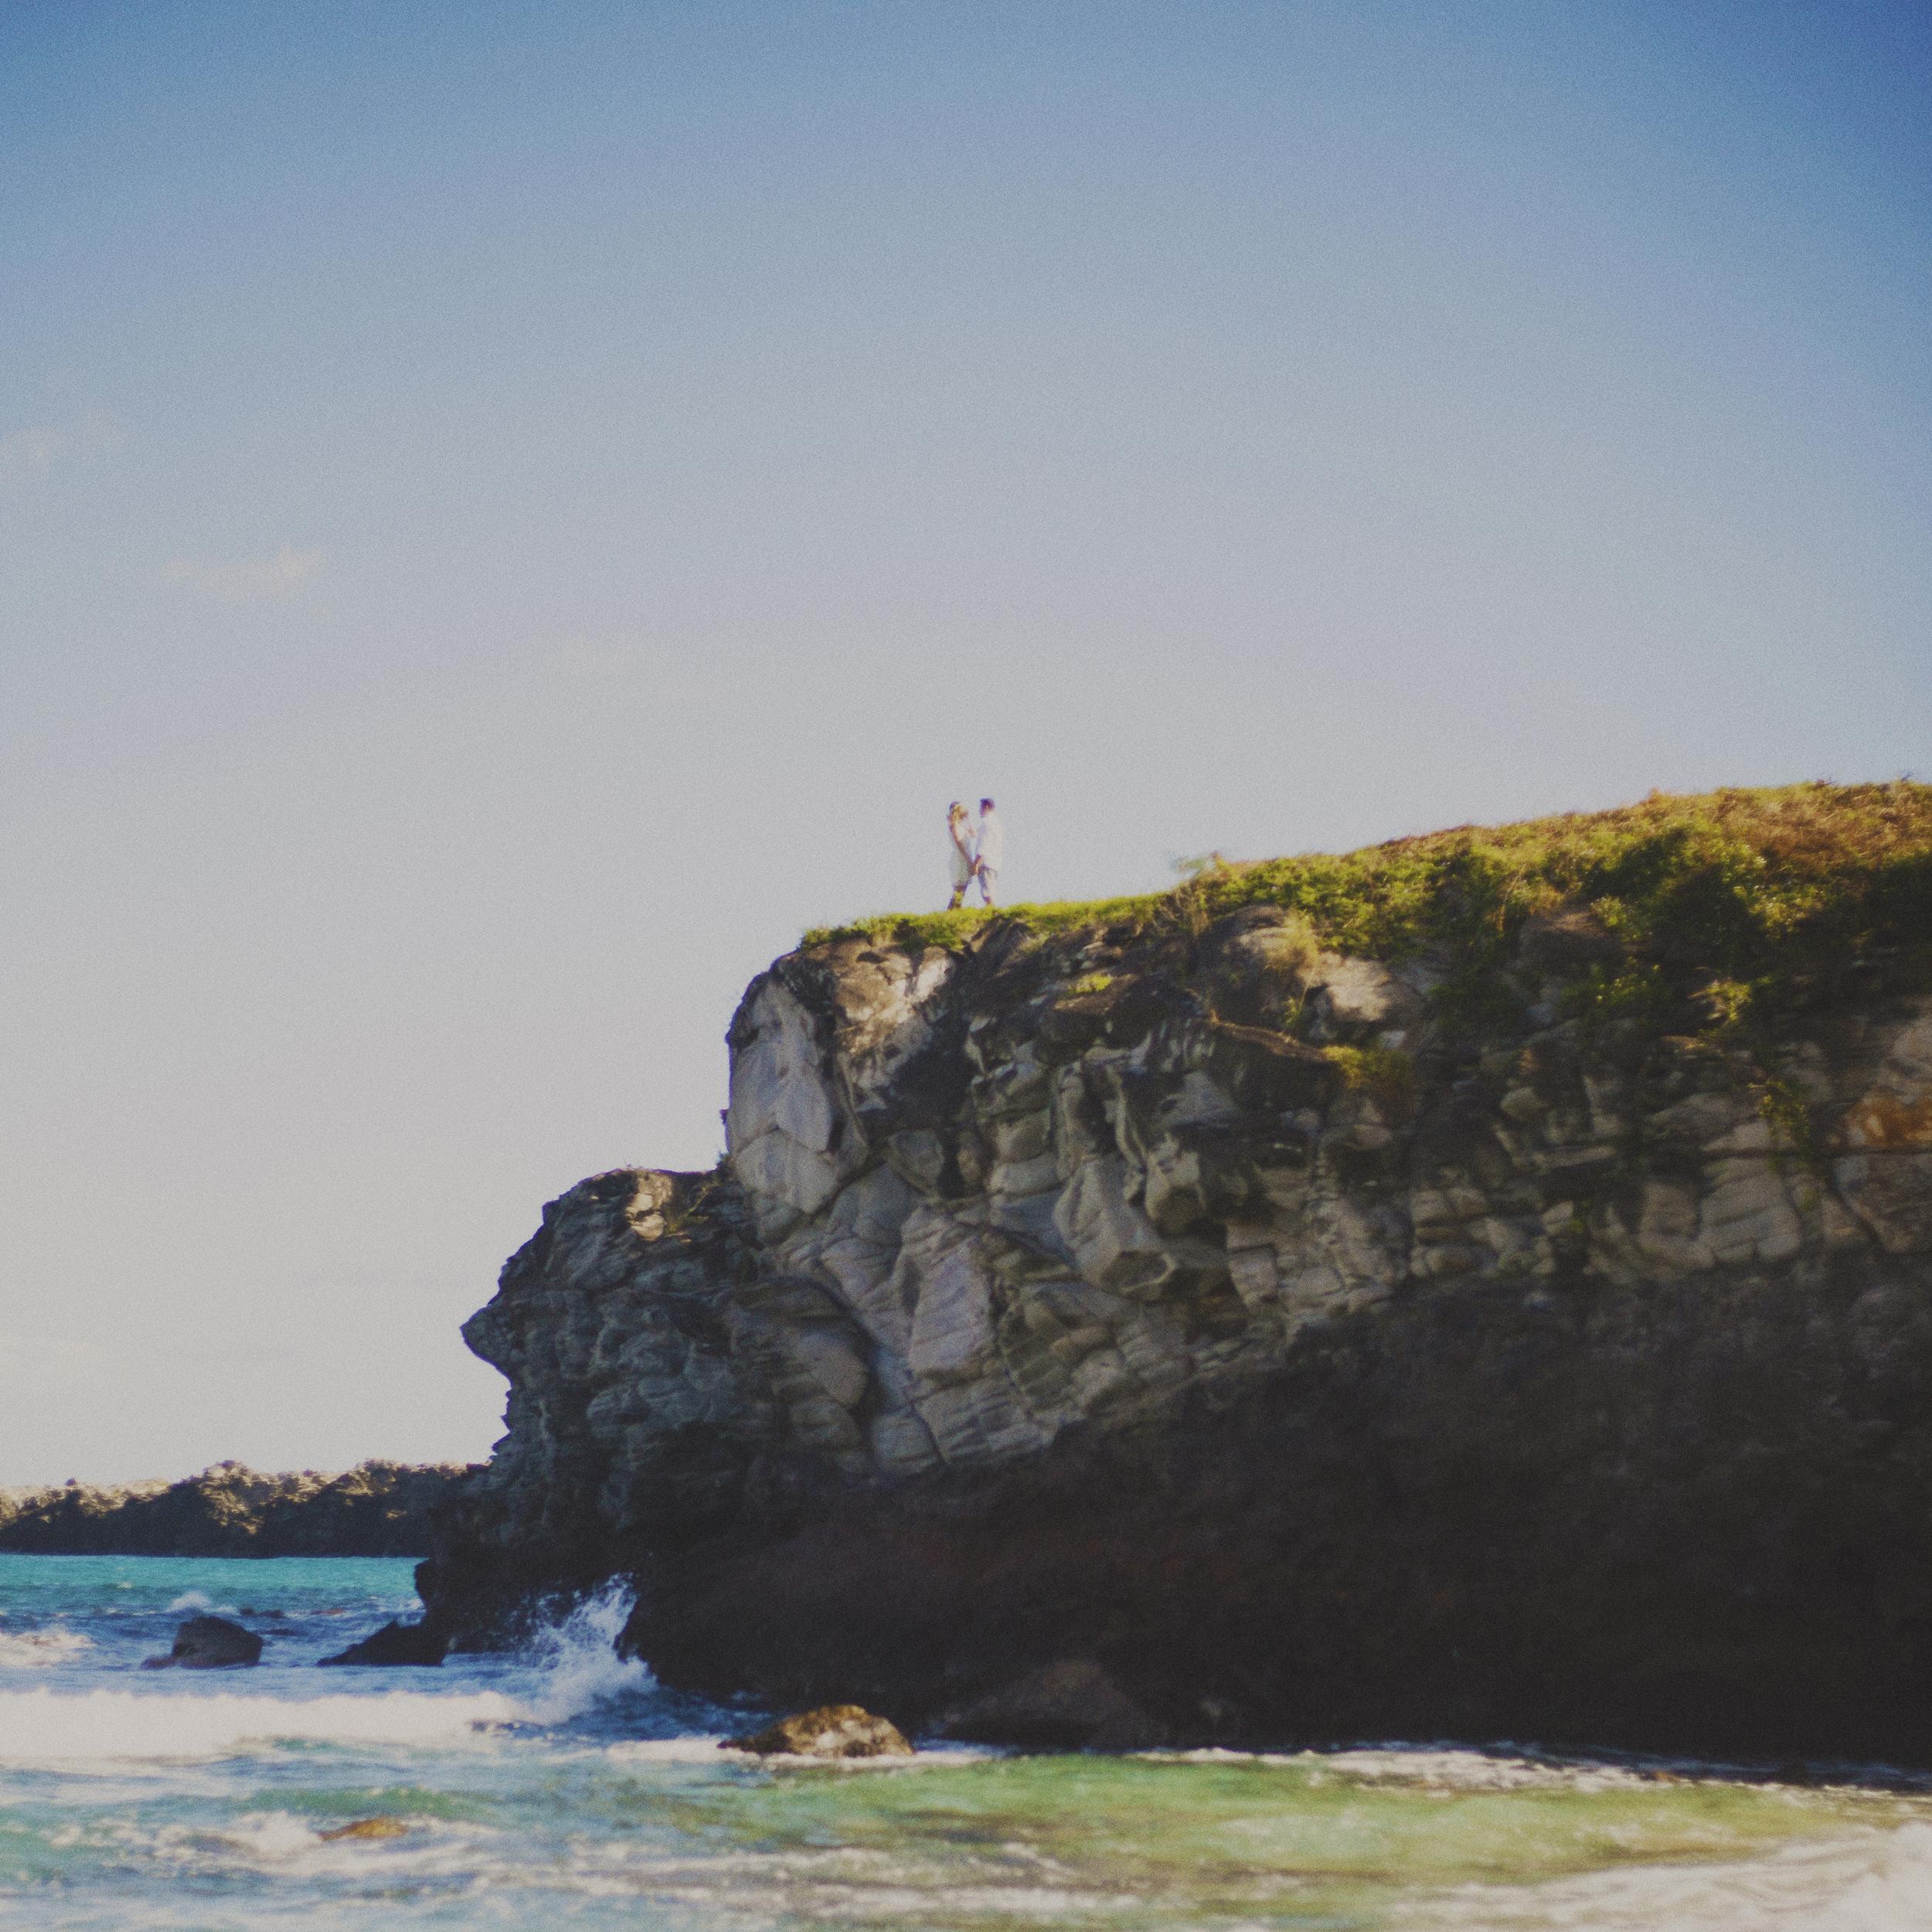 angie-diaz-photography-maui-elopement-oneloa-ironwoods-beach-12.jpg